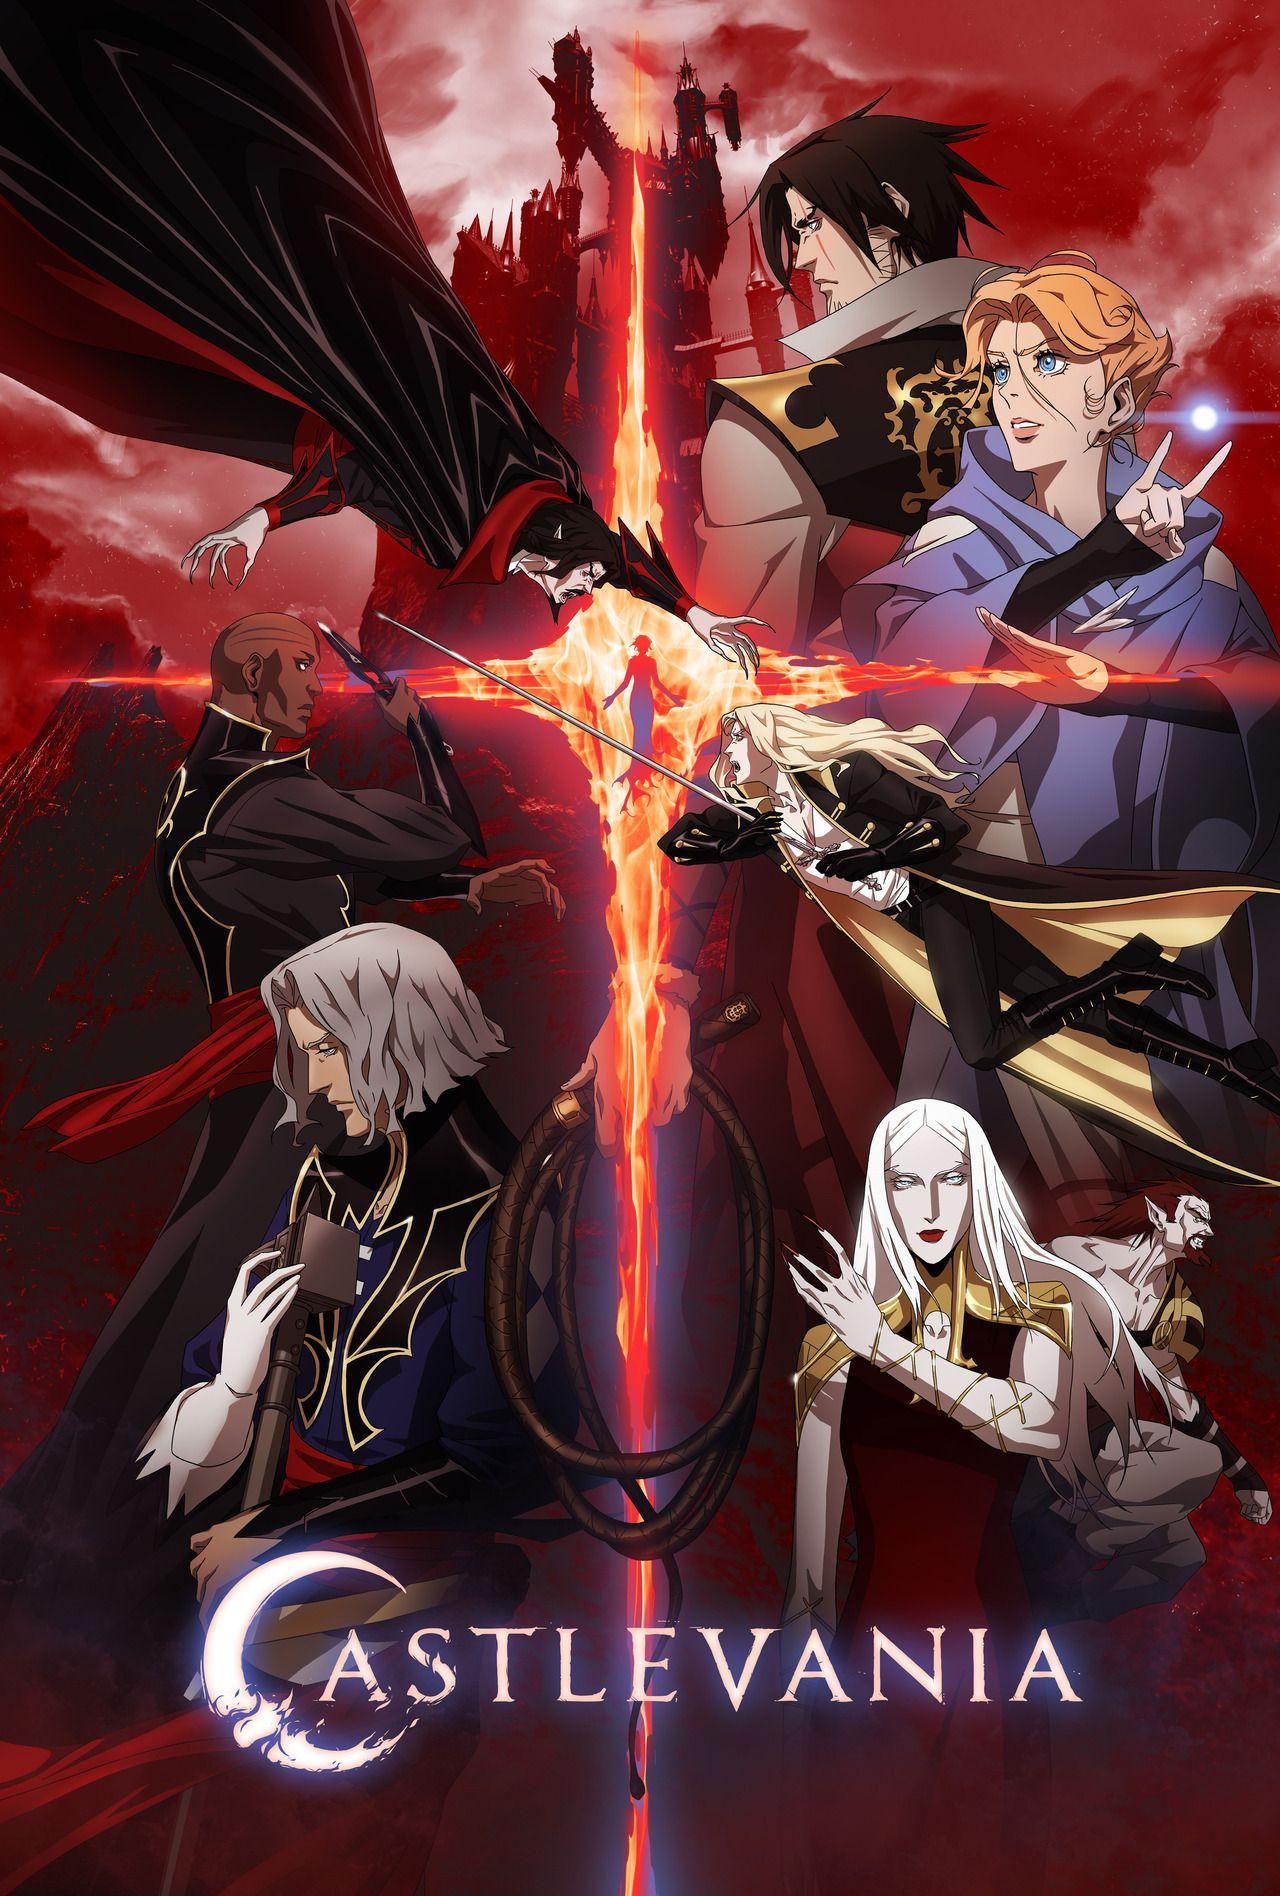 Pin by Sakura Crimons on Castlevania Anime shows, Anime